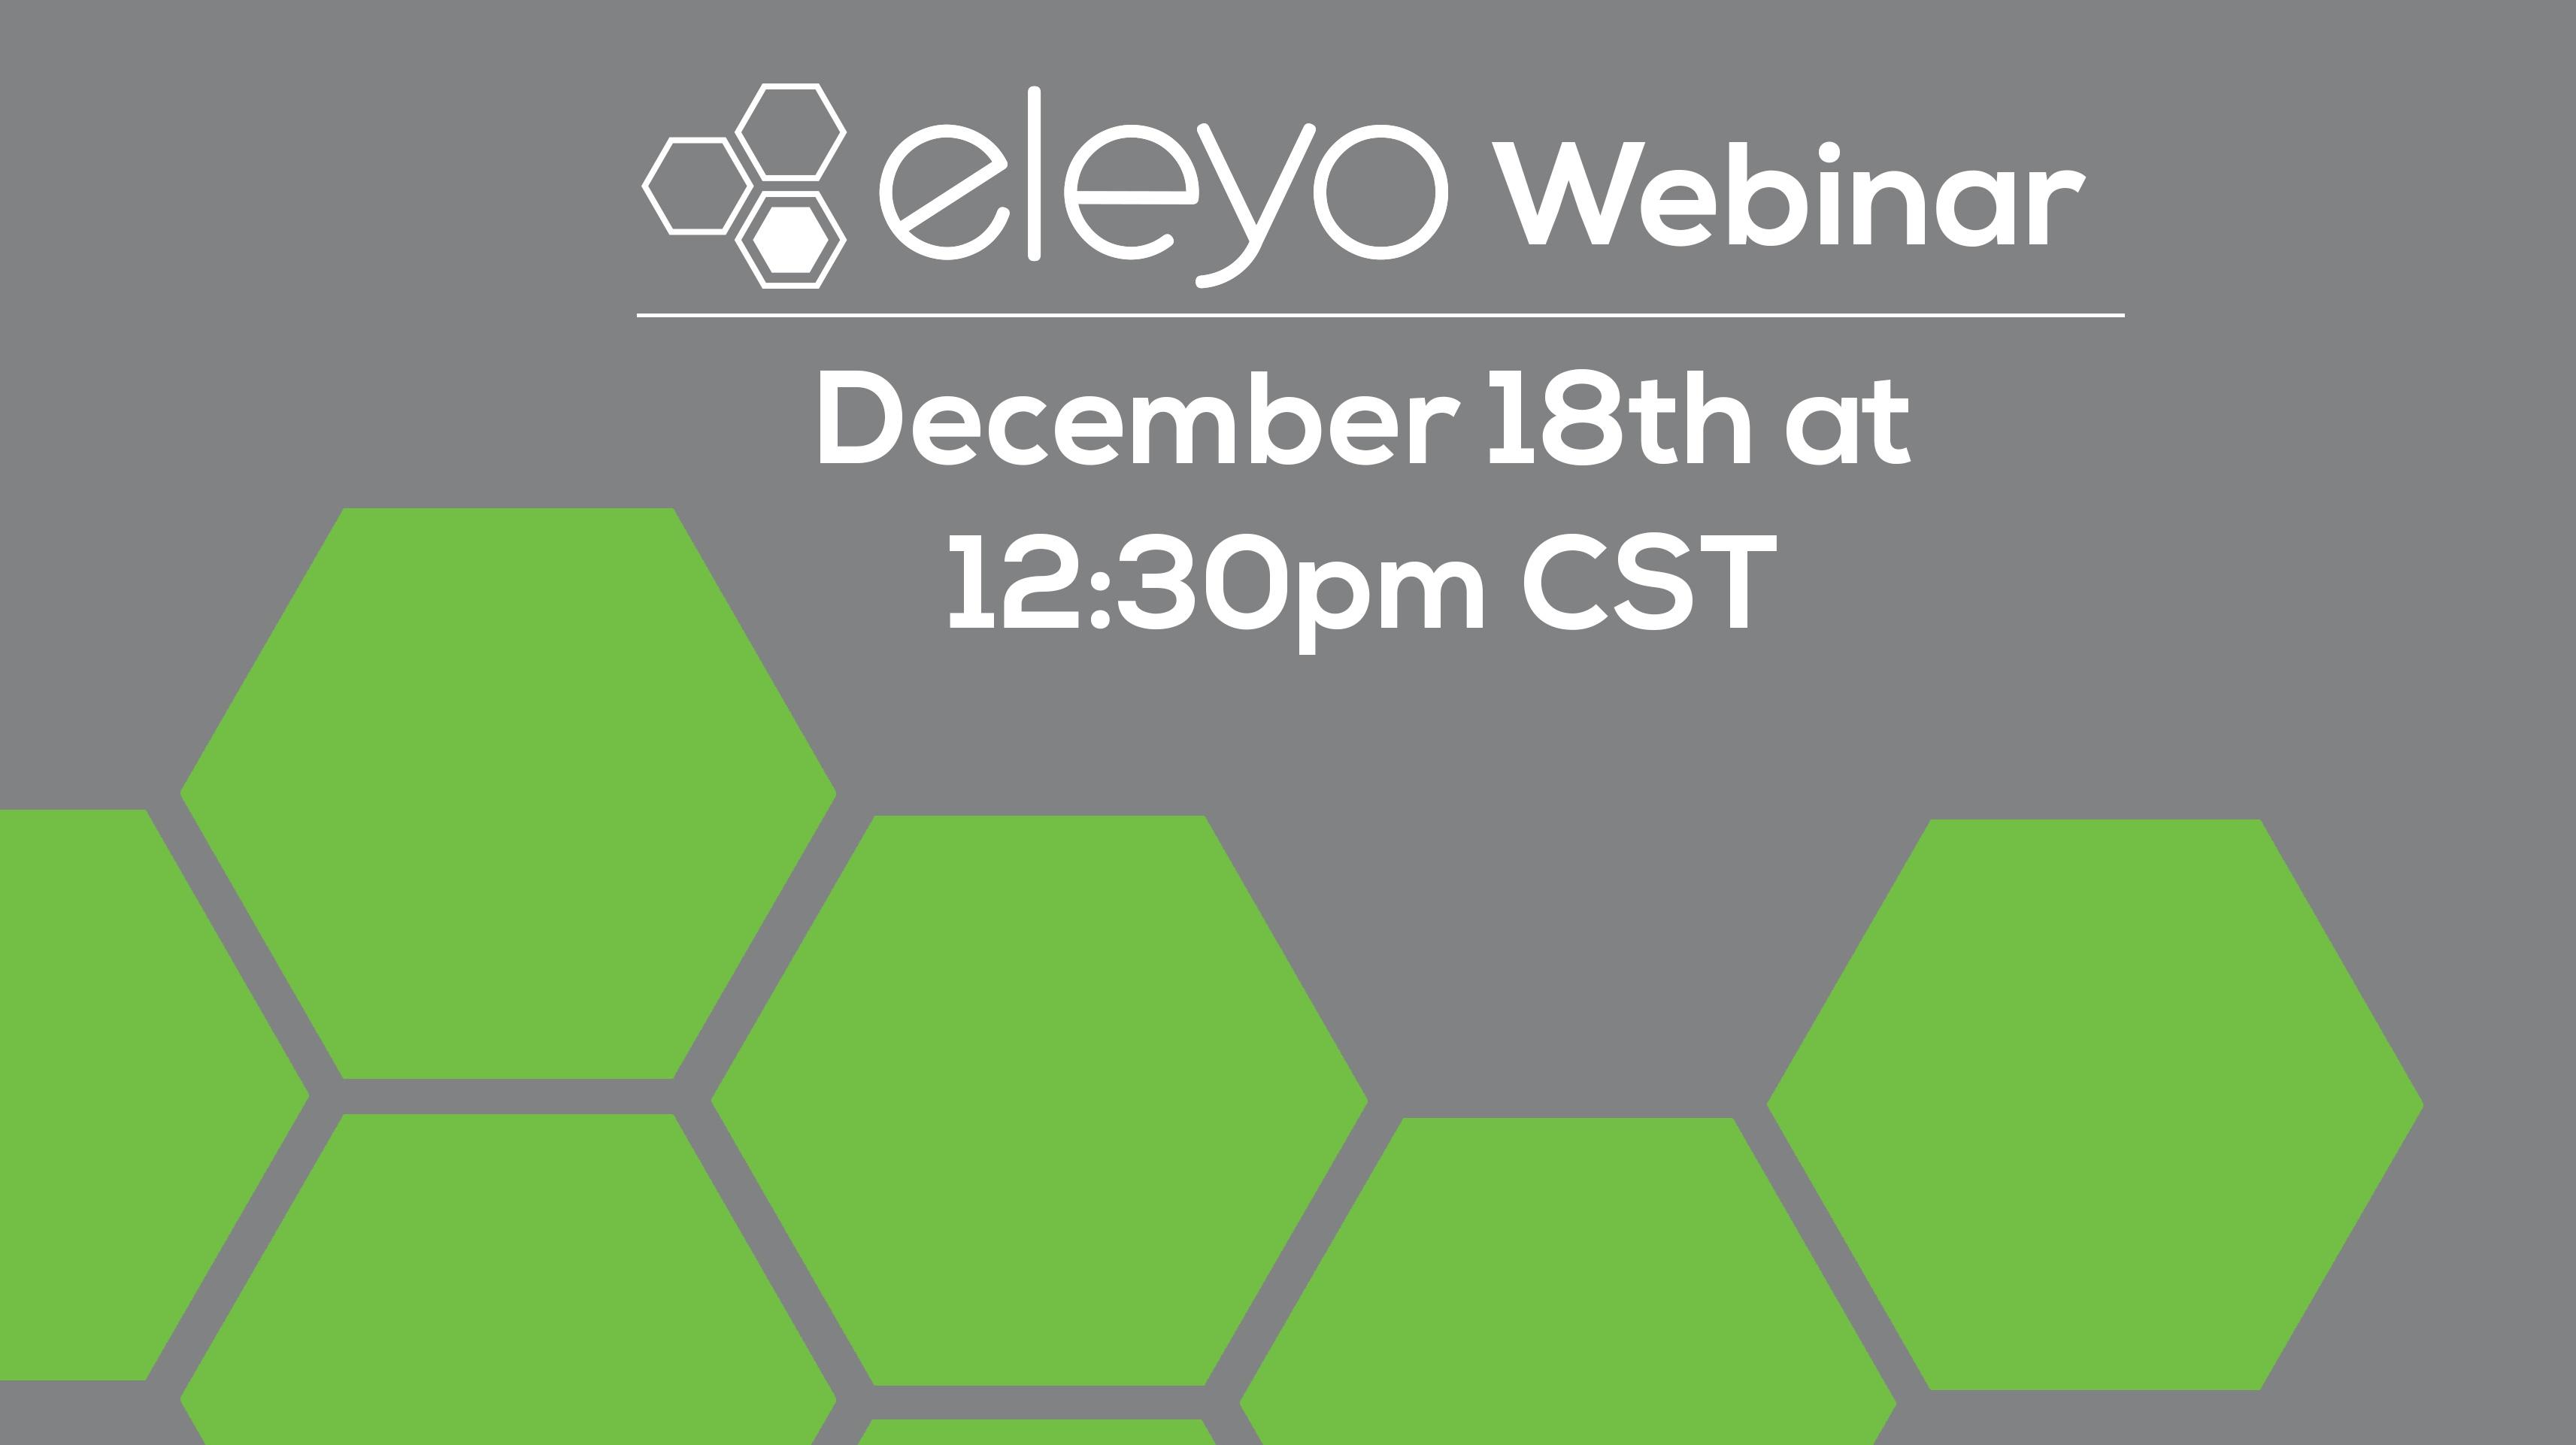 Eleyo: Simplify Program Management December 18th Webinar